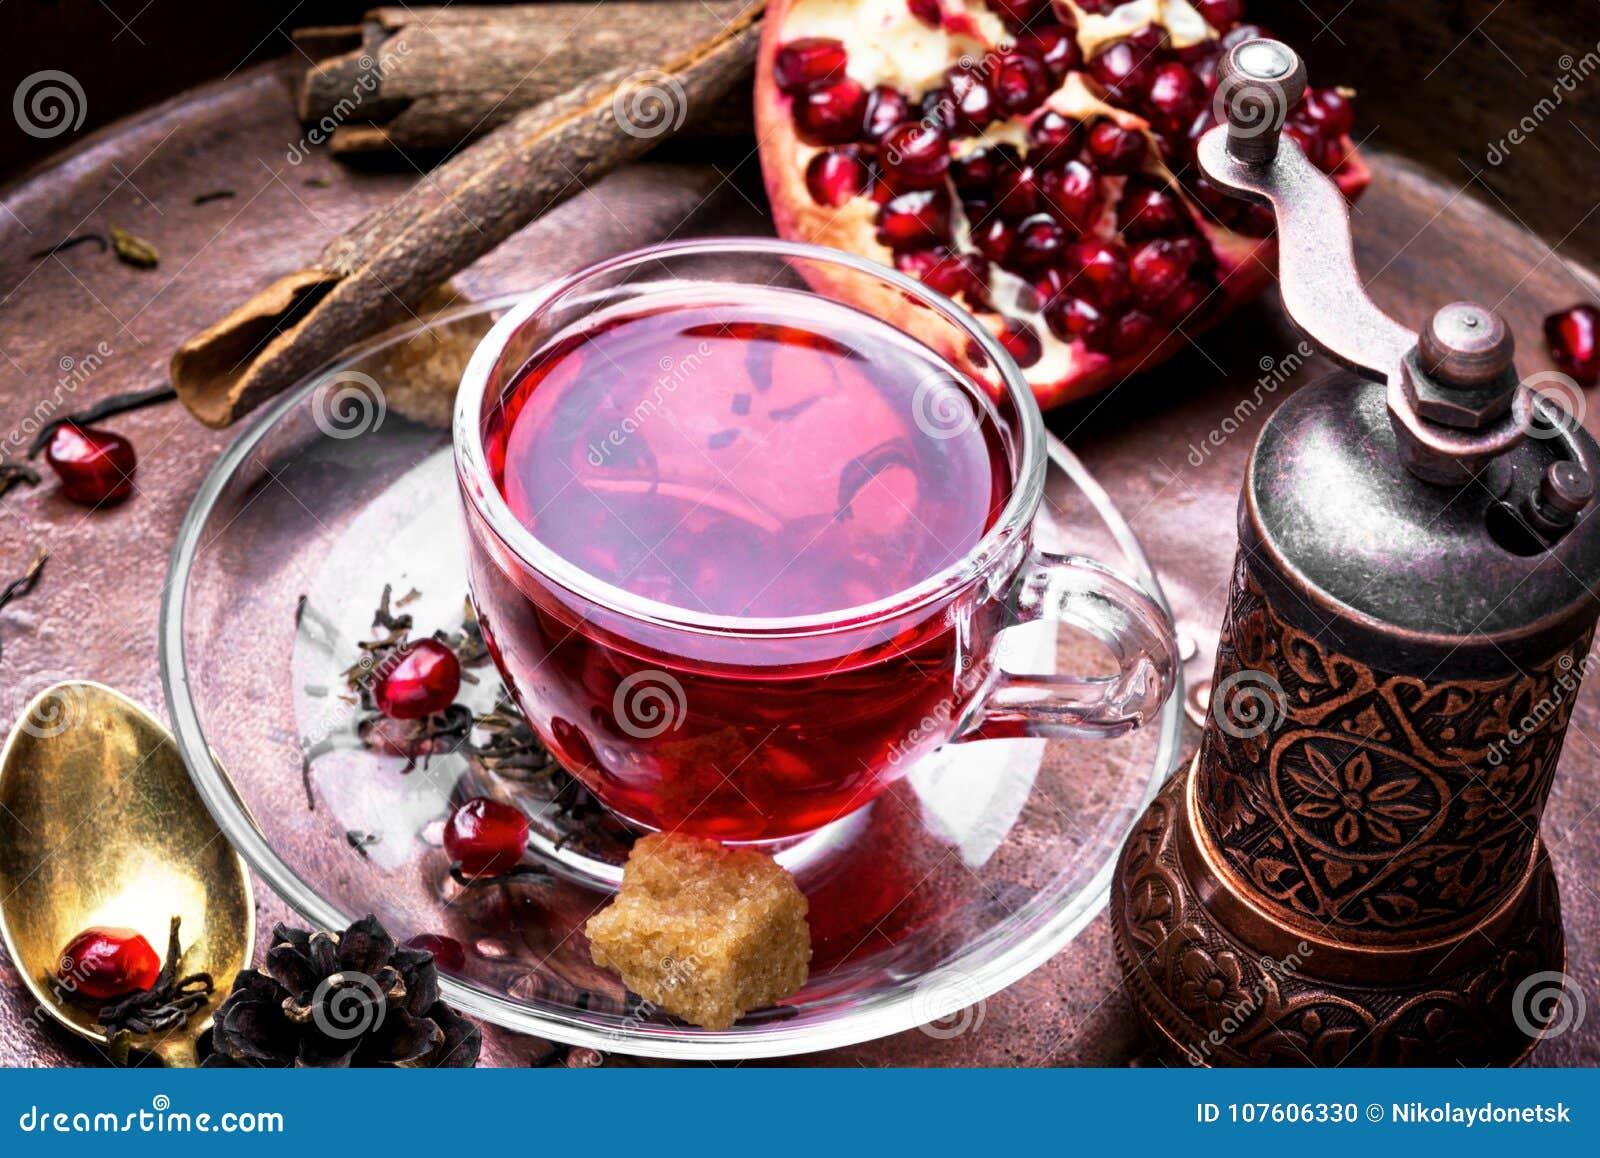 Cup of pomegranate tea